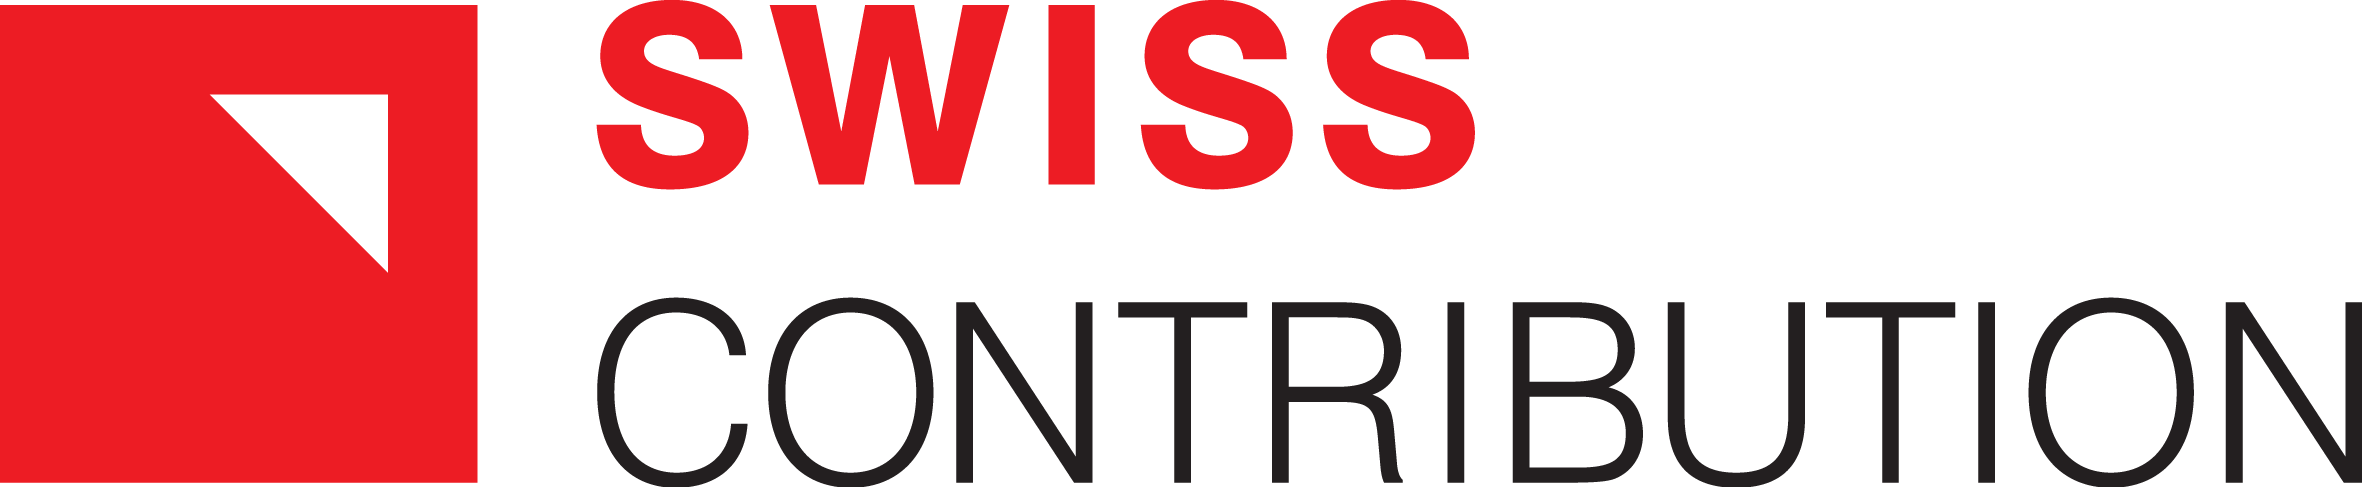 SwissContributionProgramme_logo2